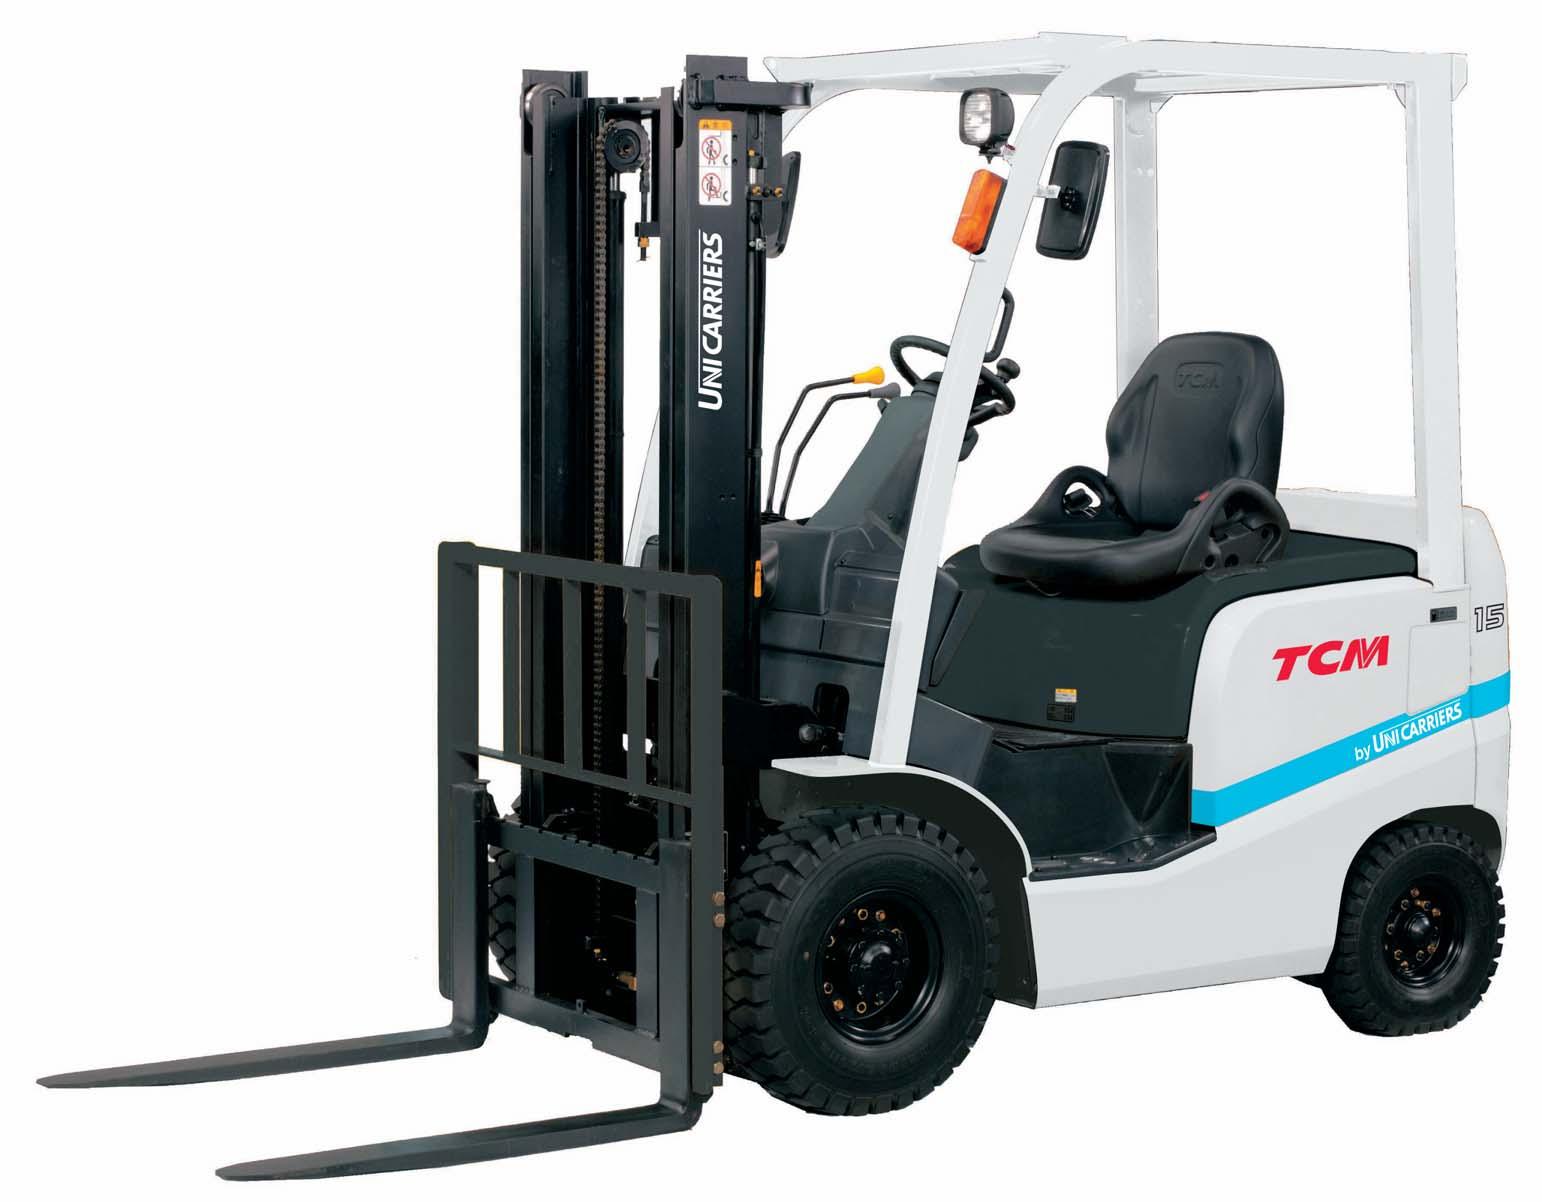 TCM FG15C13